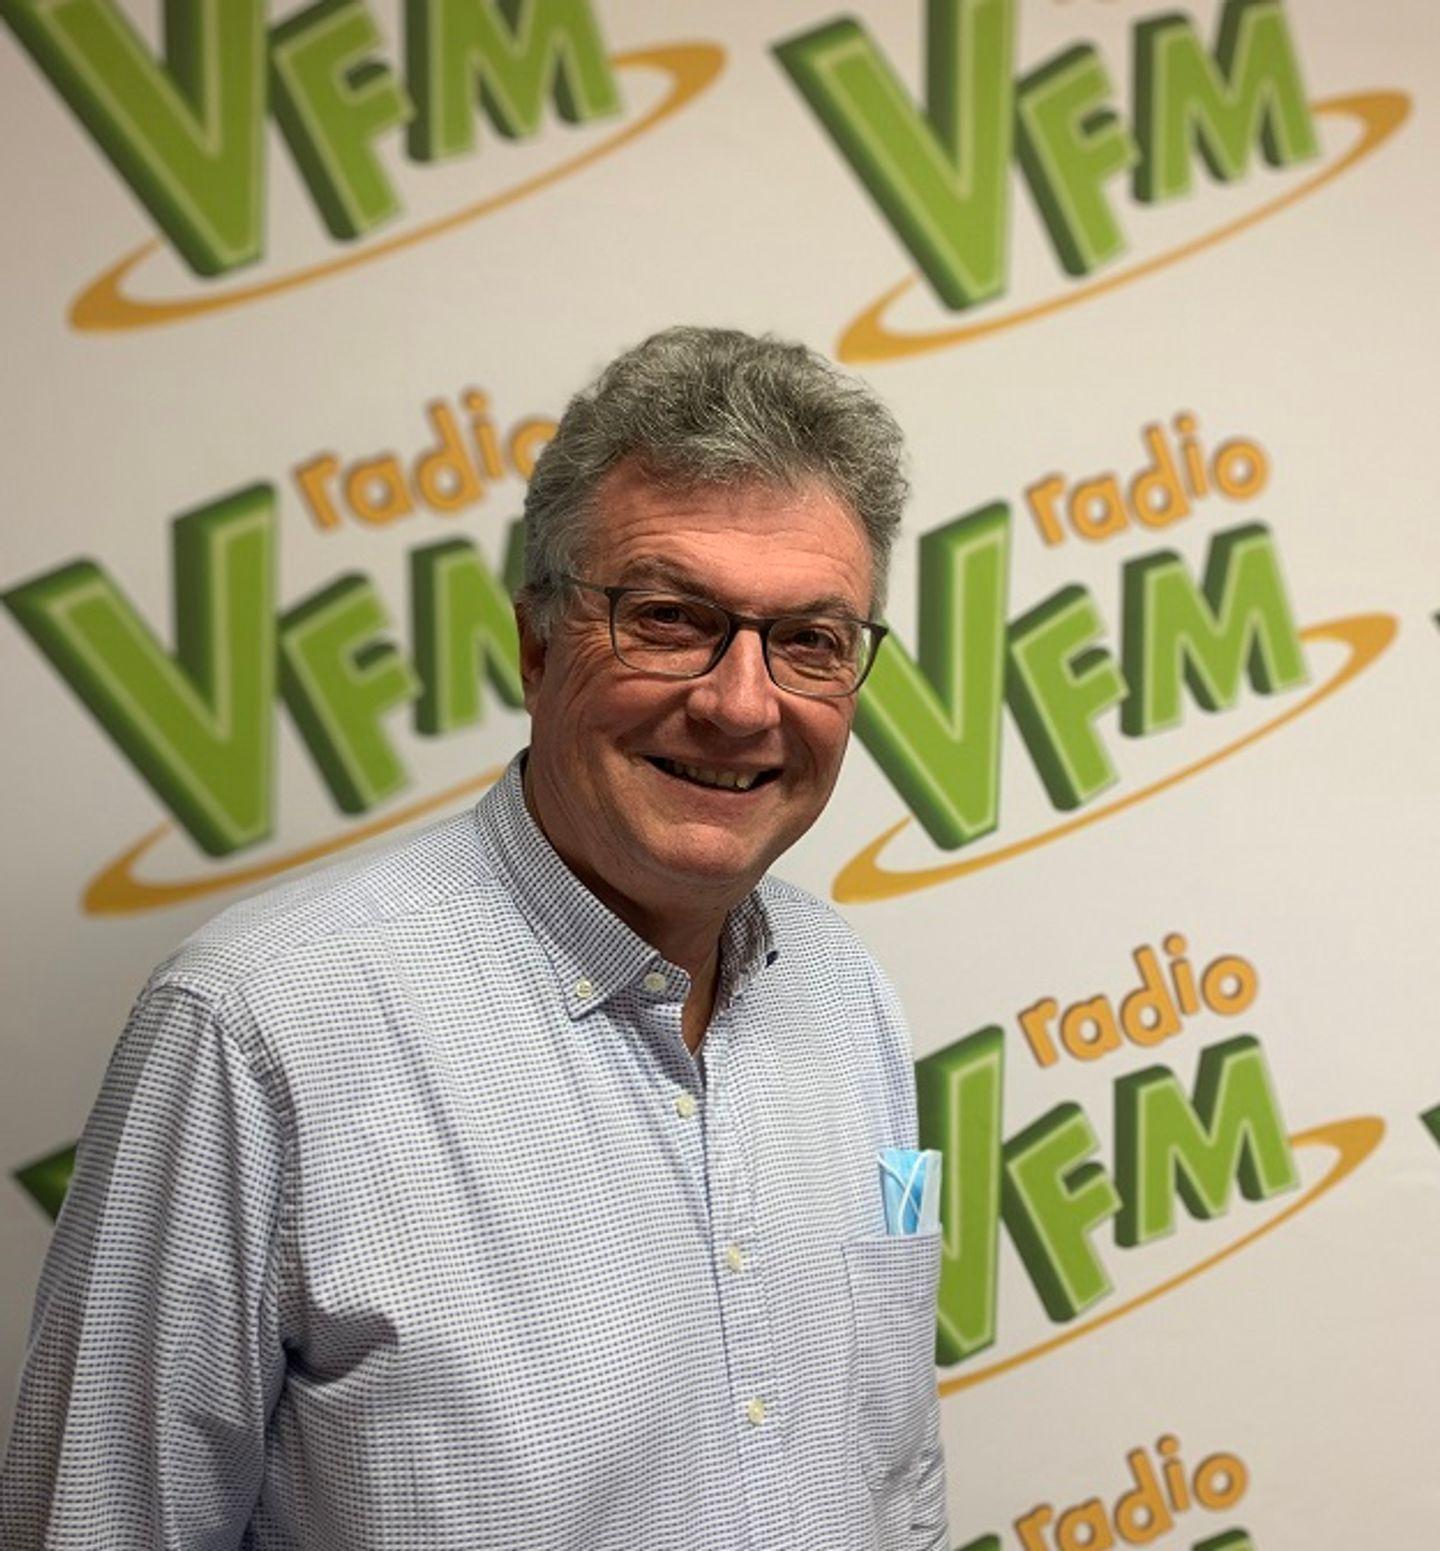 RADIO VFM